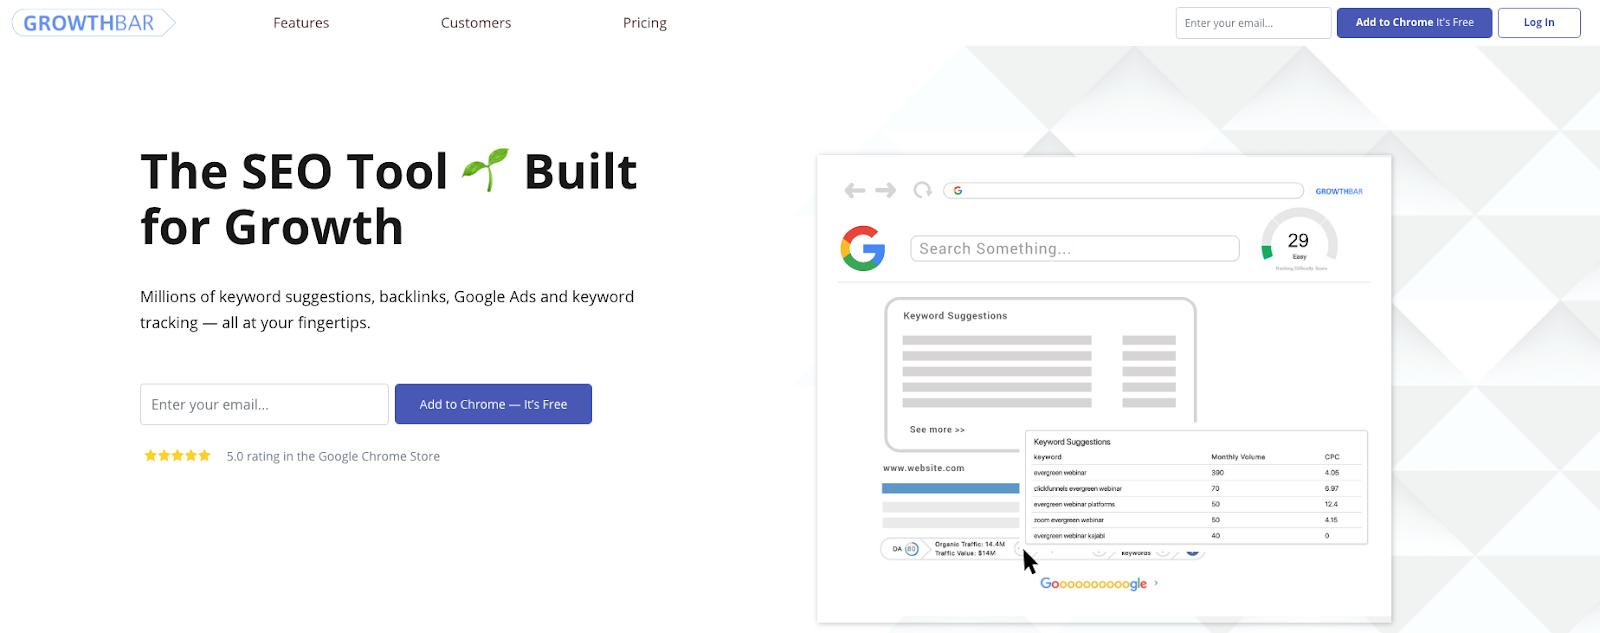 ¡Extensiones Para SEO De Google Chrome Que Debes Tener! 2